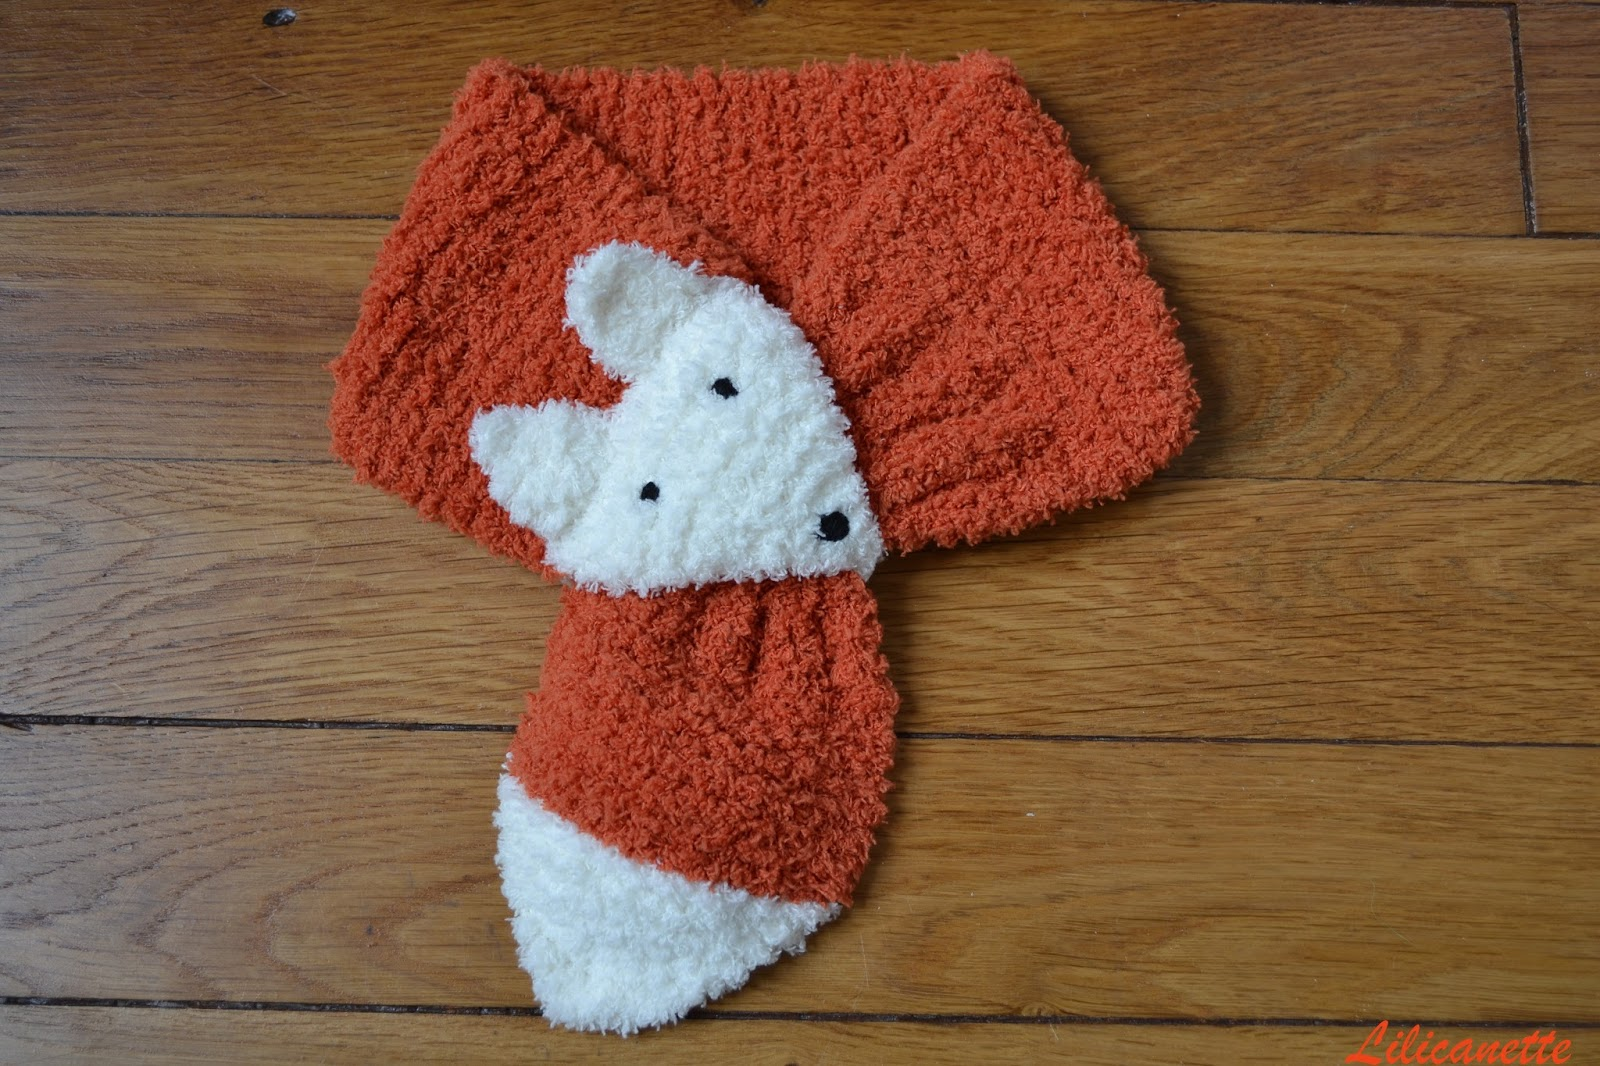 5523683b76a Modele tricot echarpe renard - altoservices